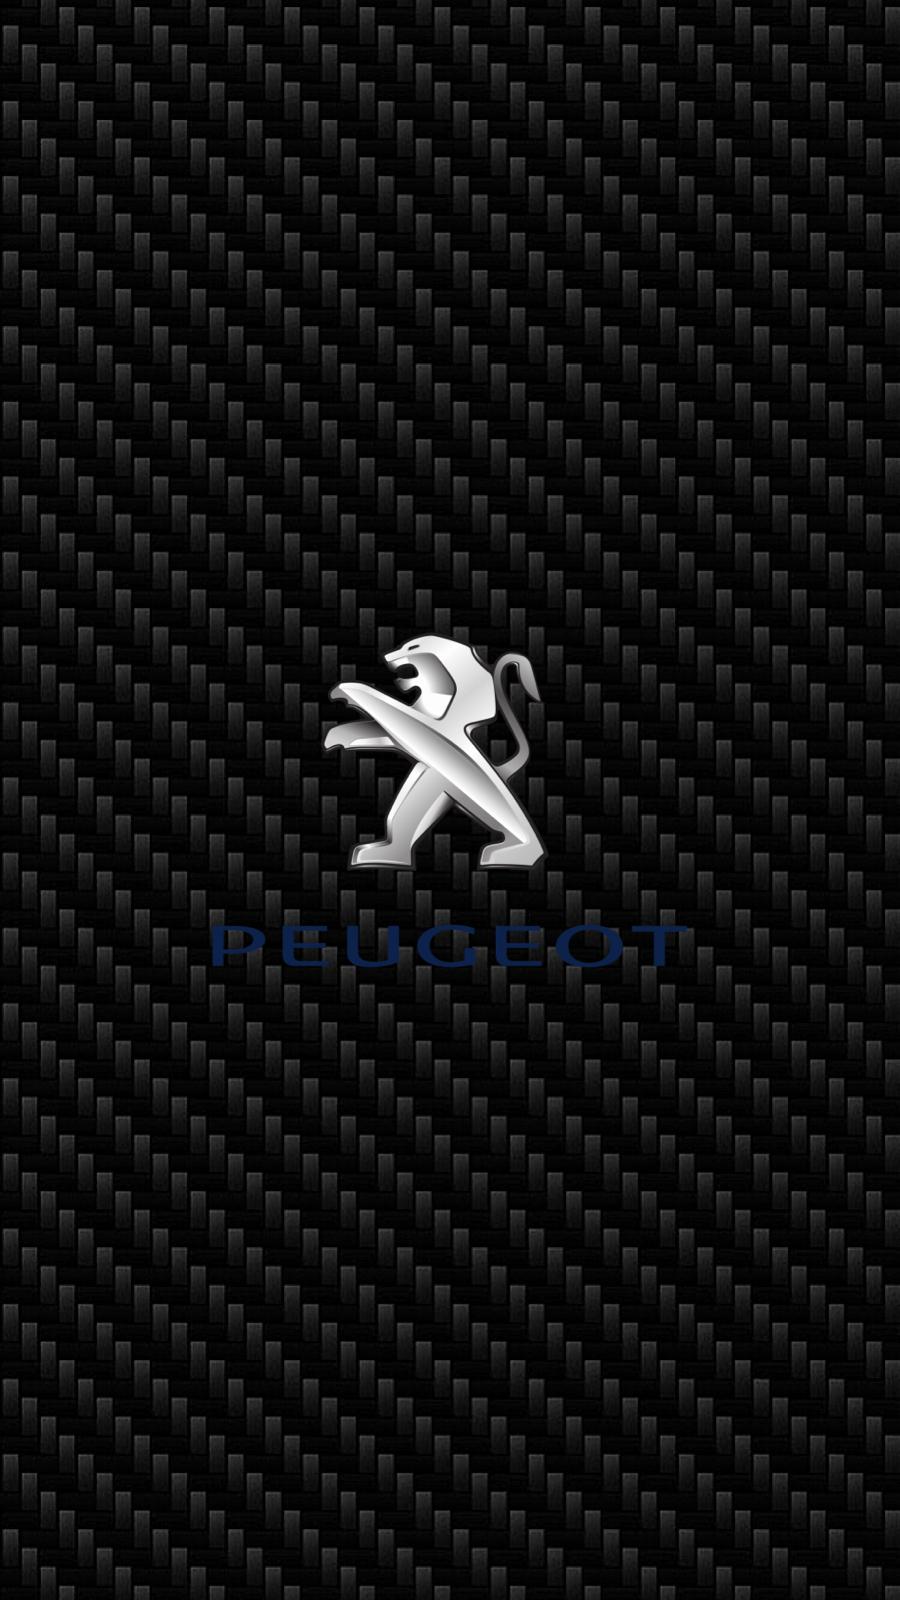 Peugeot おしゃれまとめの人気アイデア Pinterest Svyatoslav Prociv プジョー